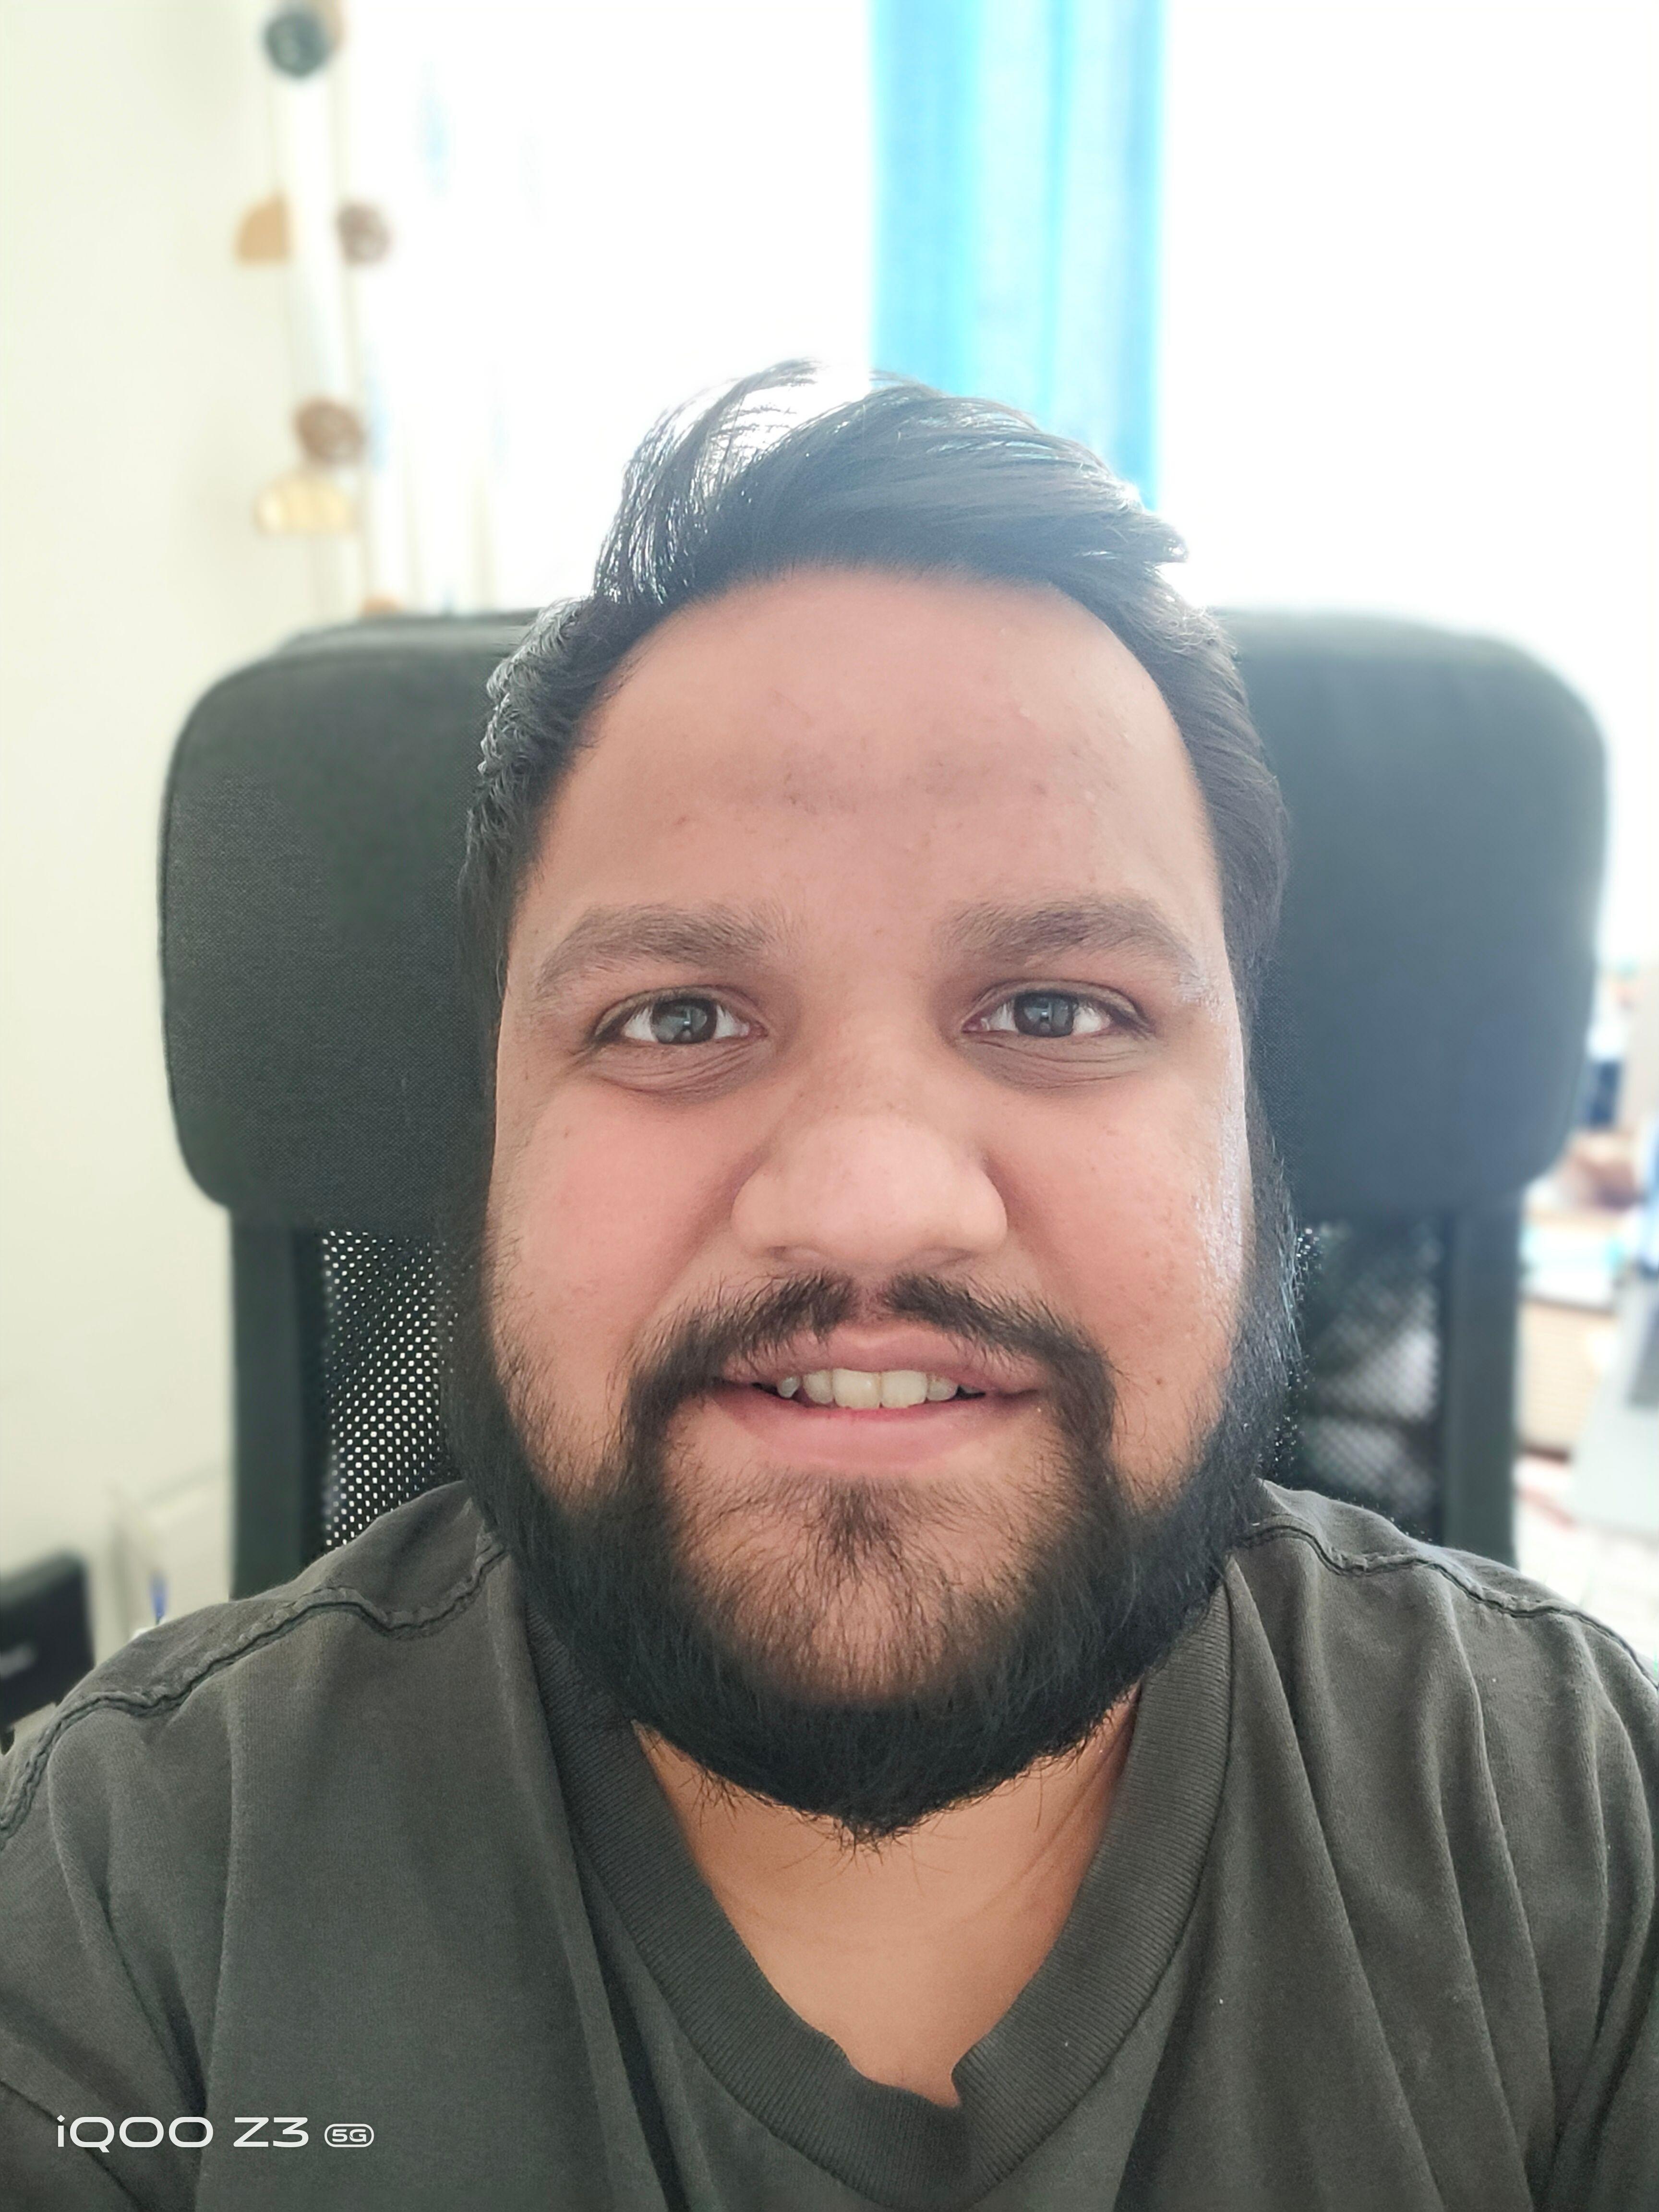 iQOO Z3 5G Camera Selfie